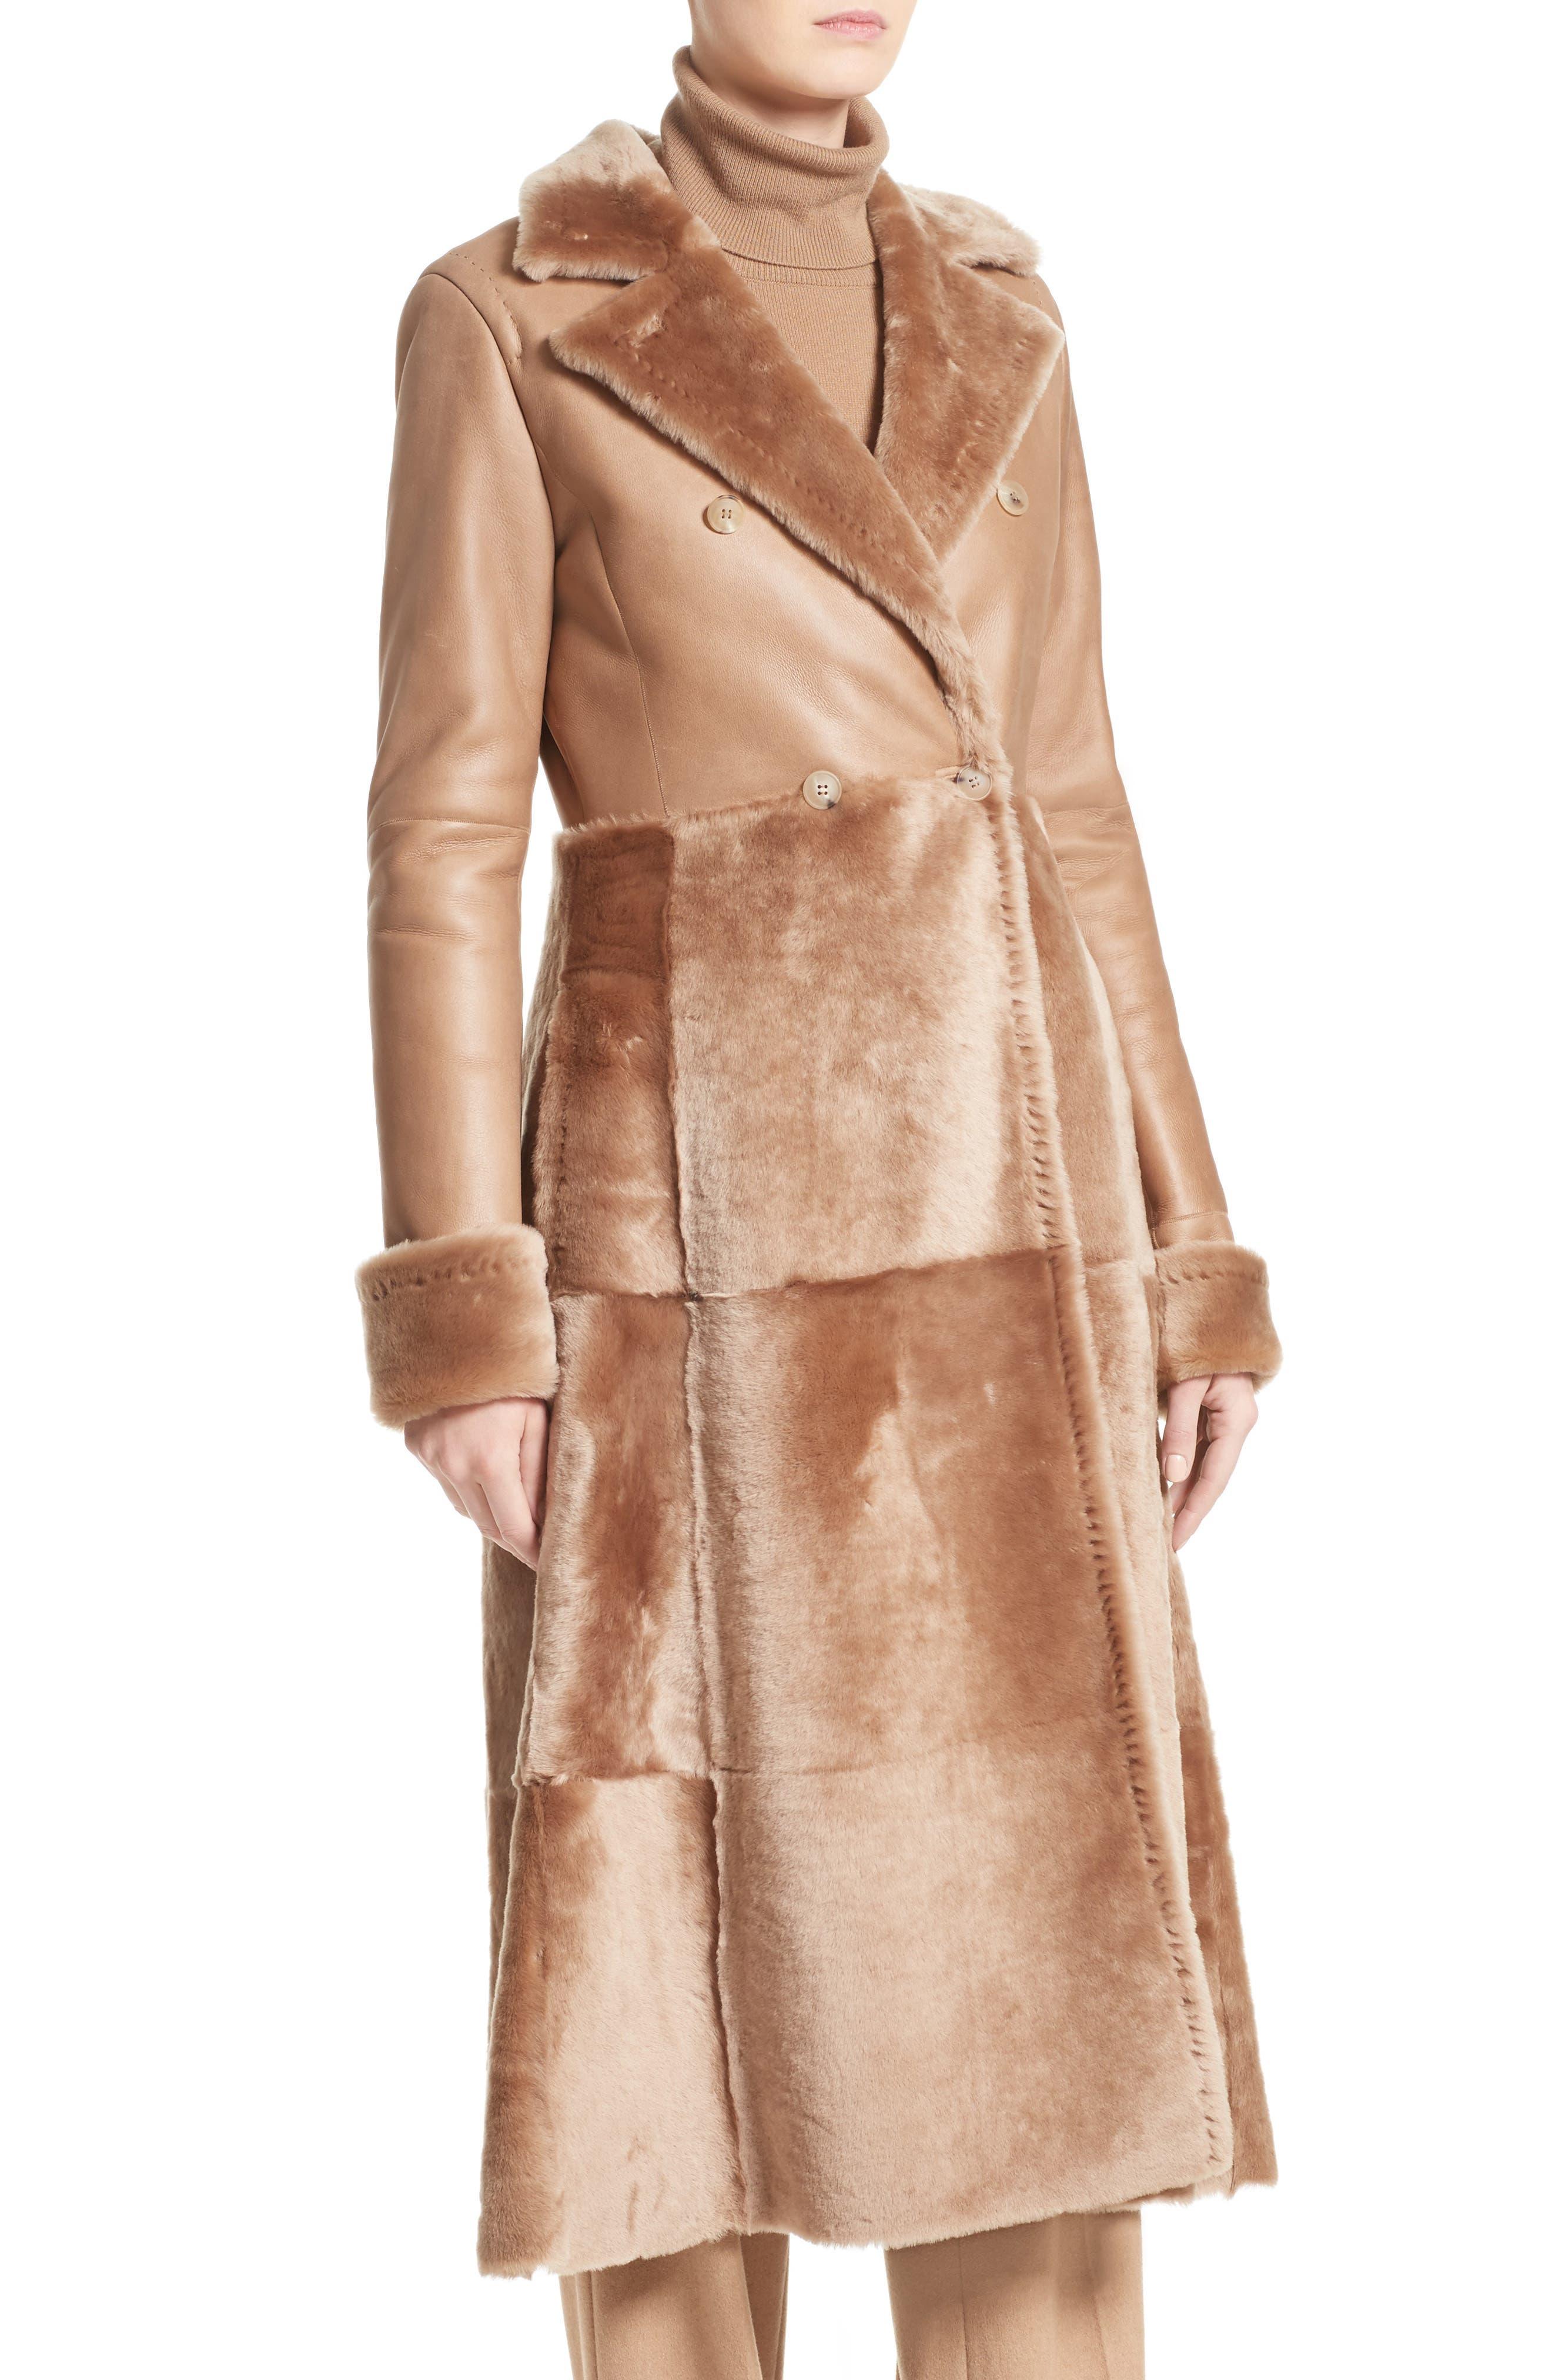 Rimini Genuine Shearling Coat,                             Alternate thumbnail 4, color,                             CAMEL